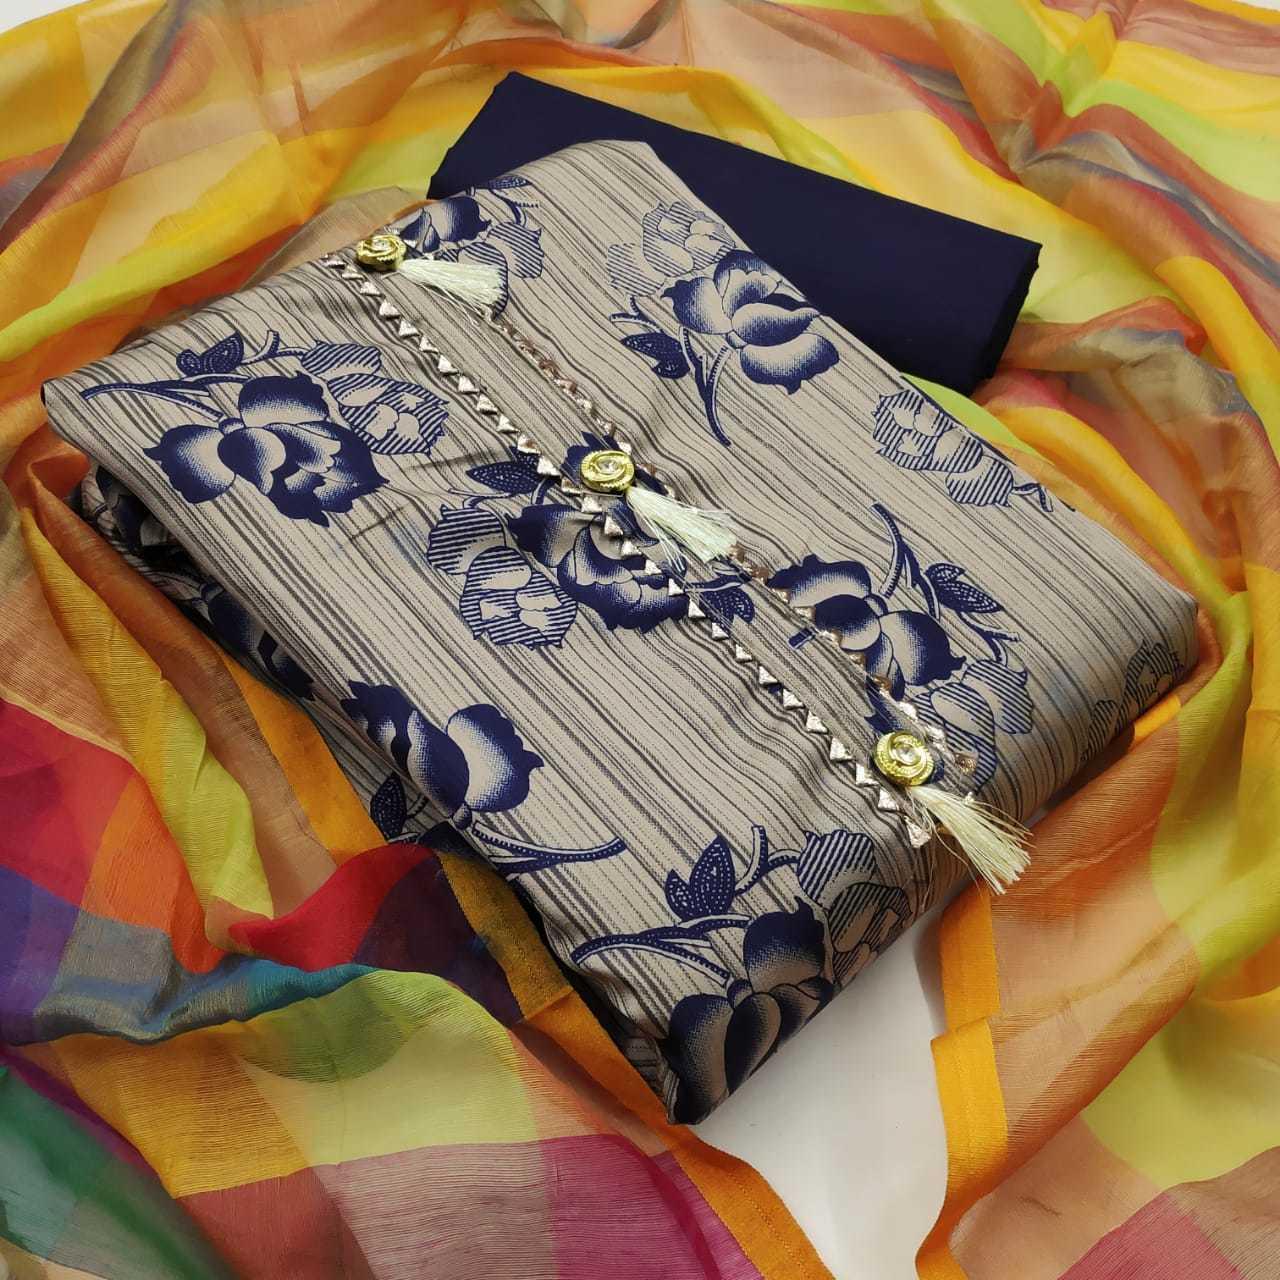 Camric Cotton Material